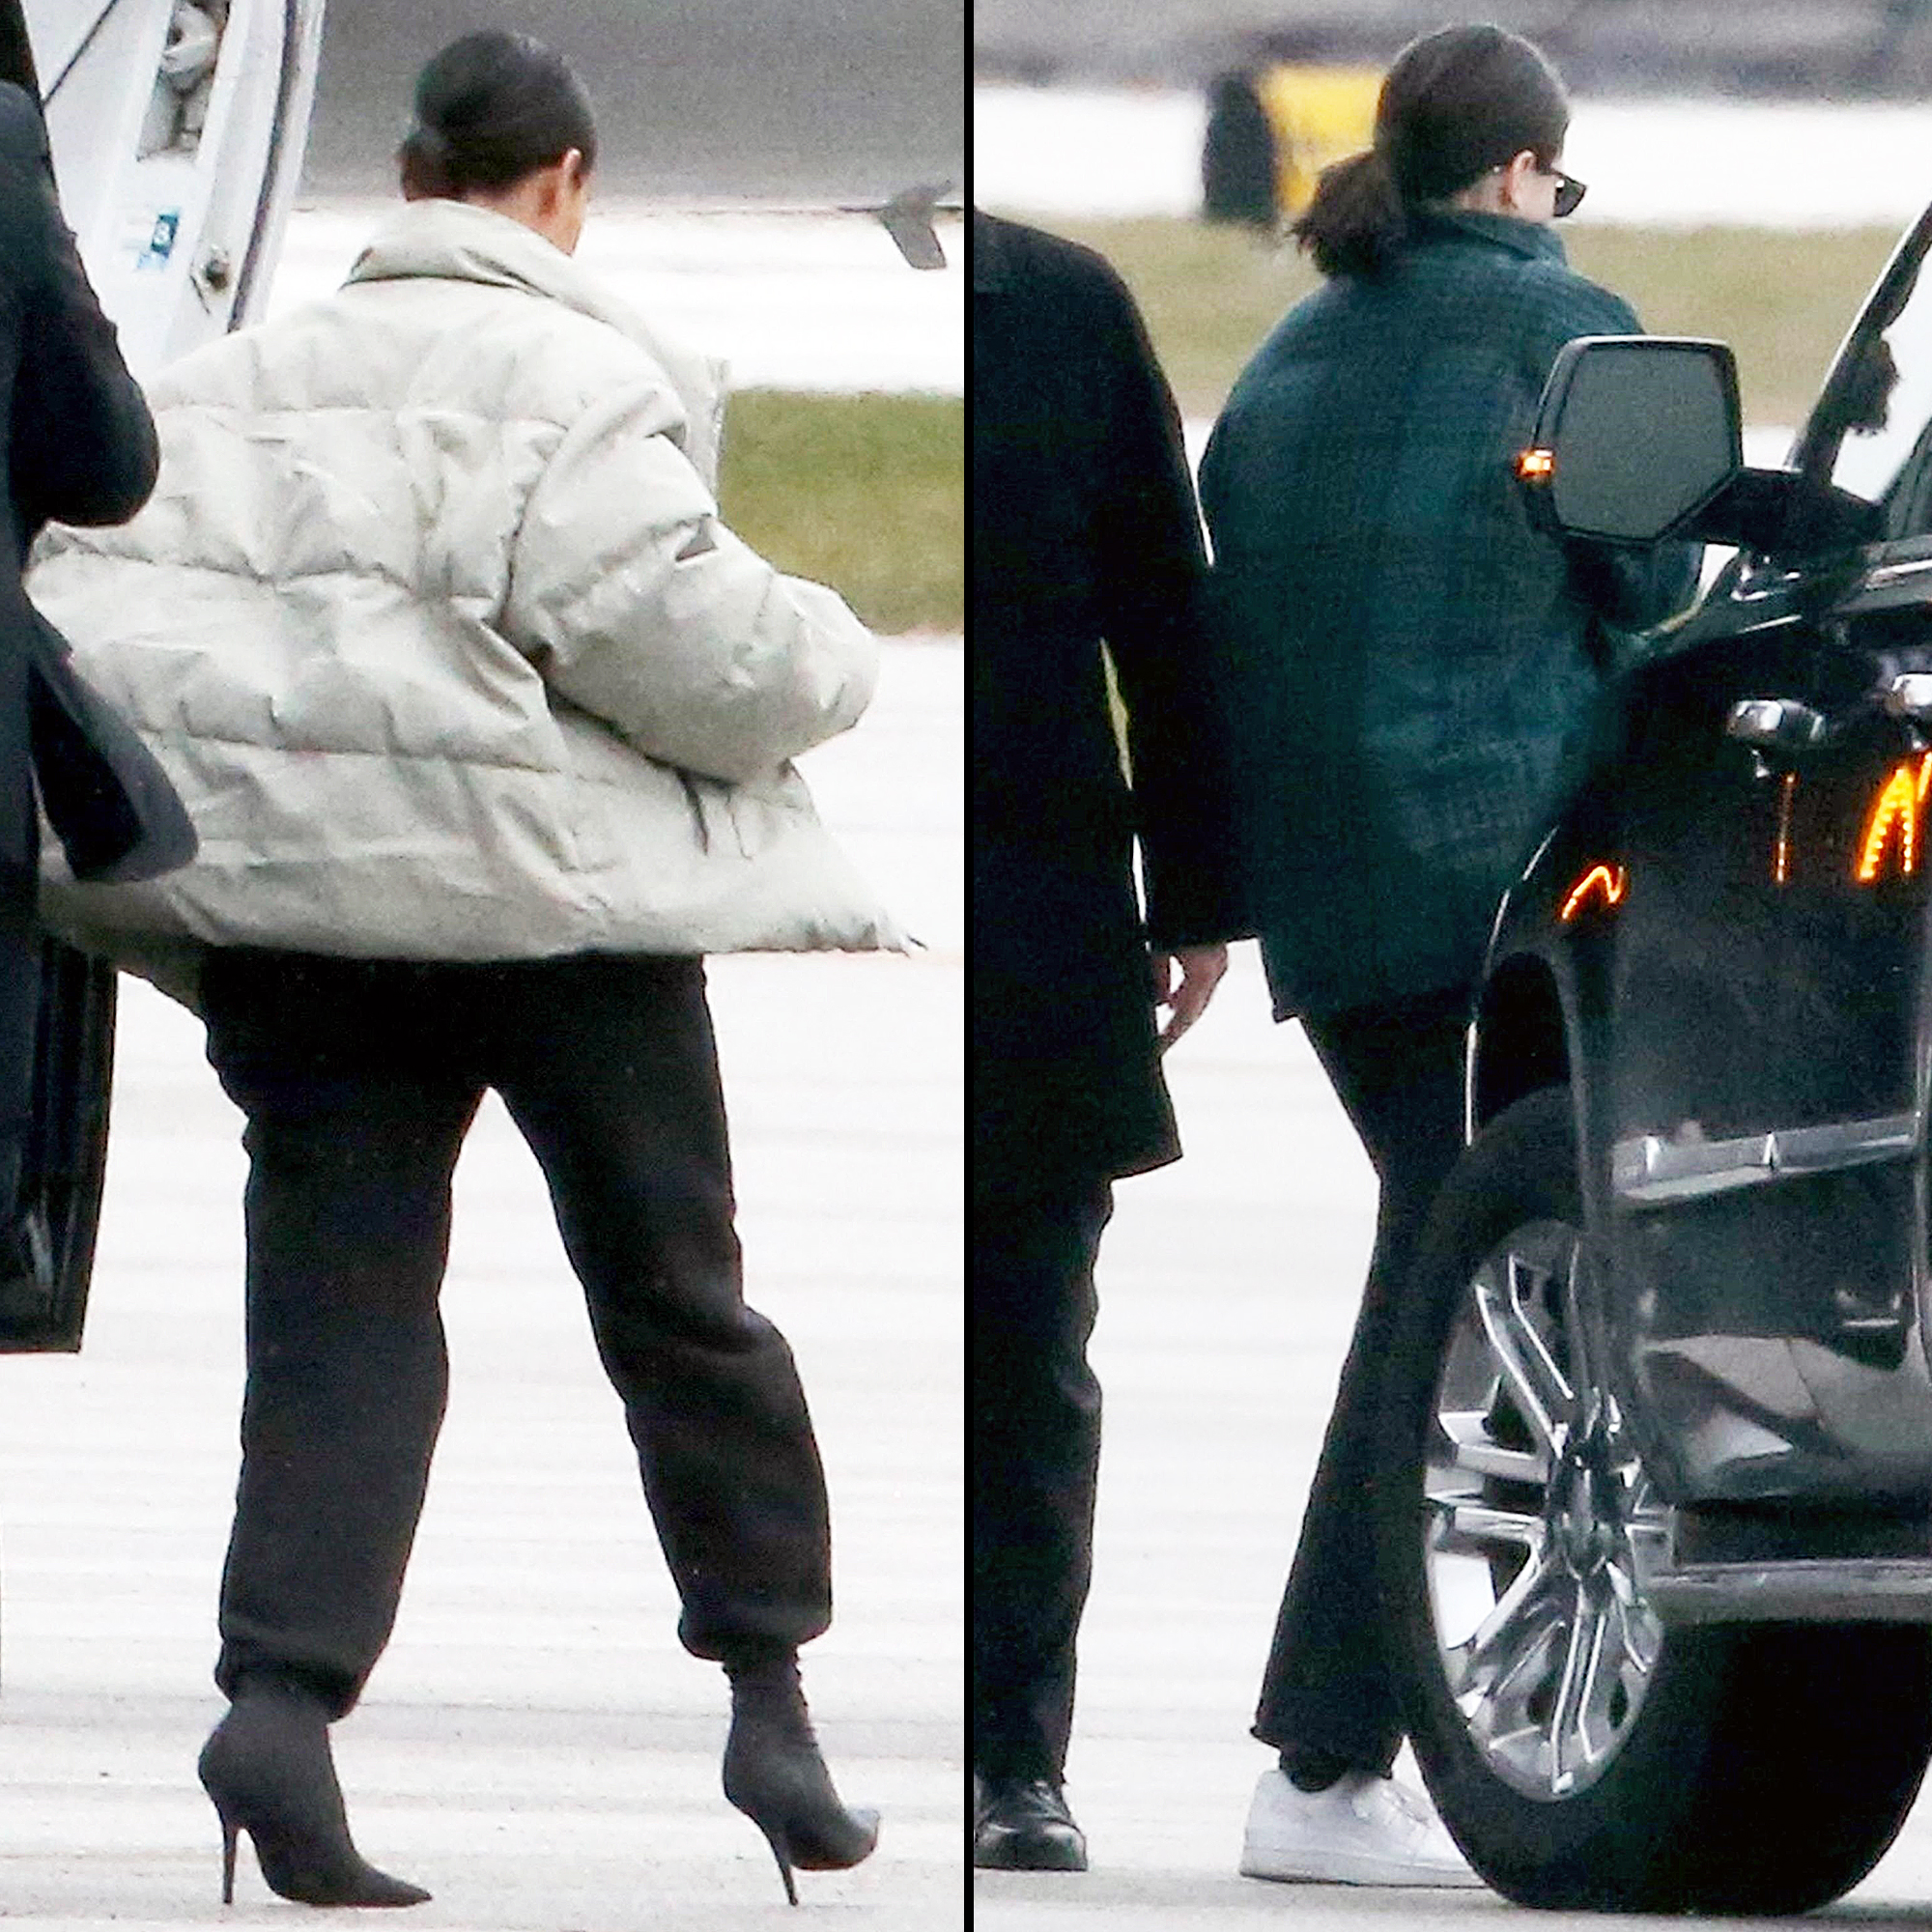 Kardashian Sisters Leave Cleveland